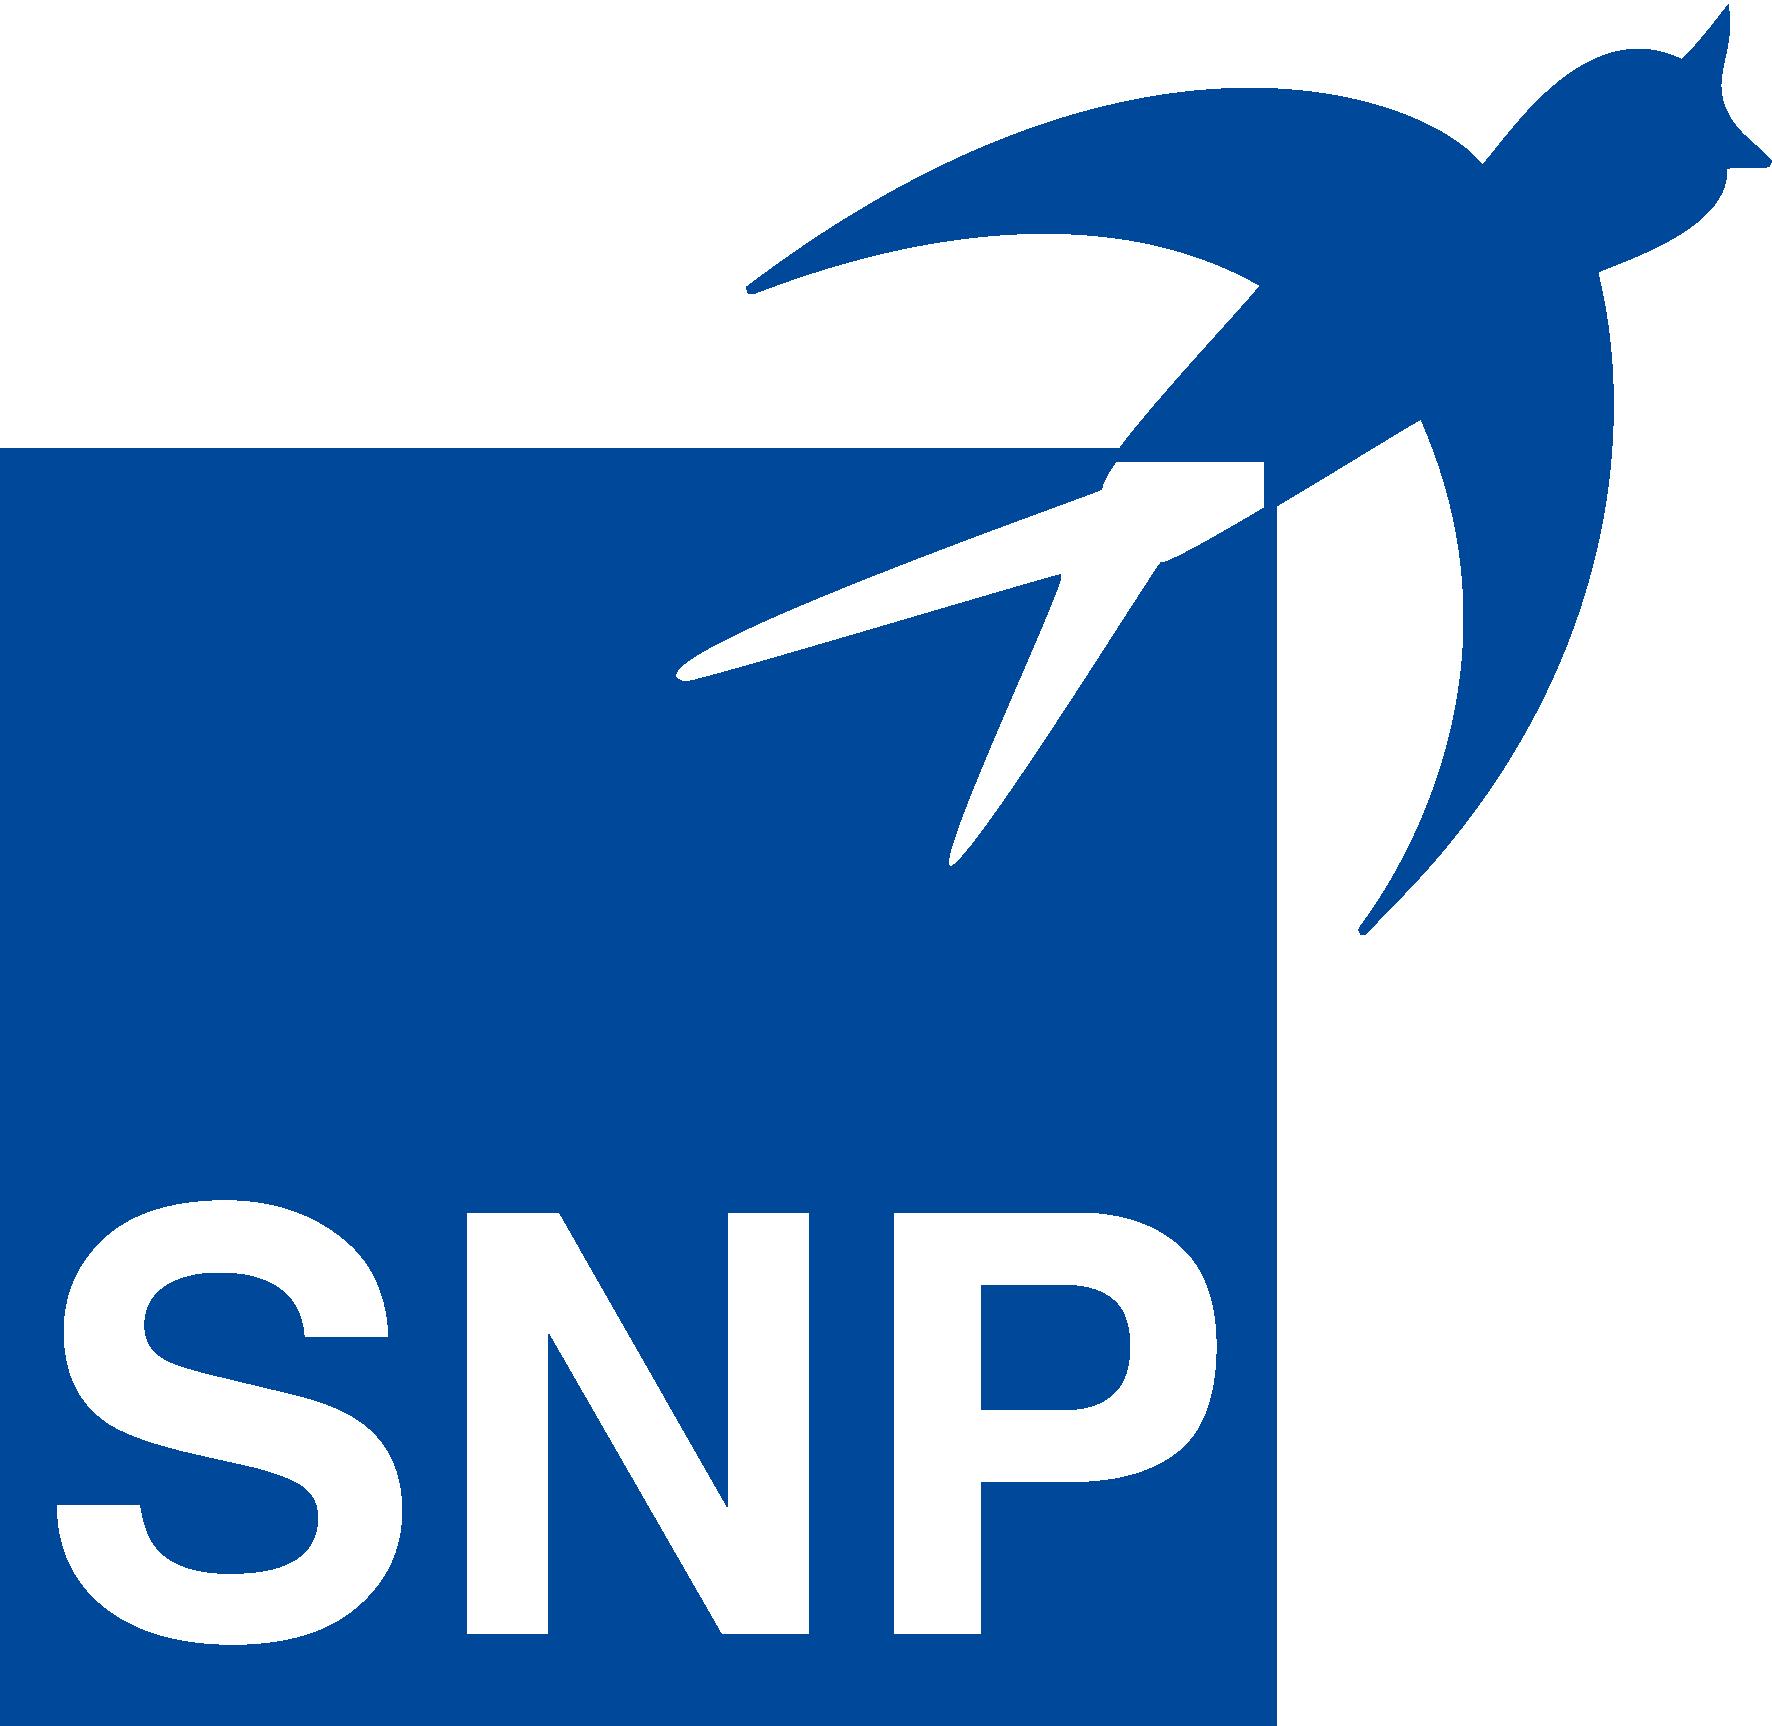 SNP Blue 2019.2020